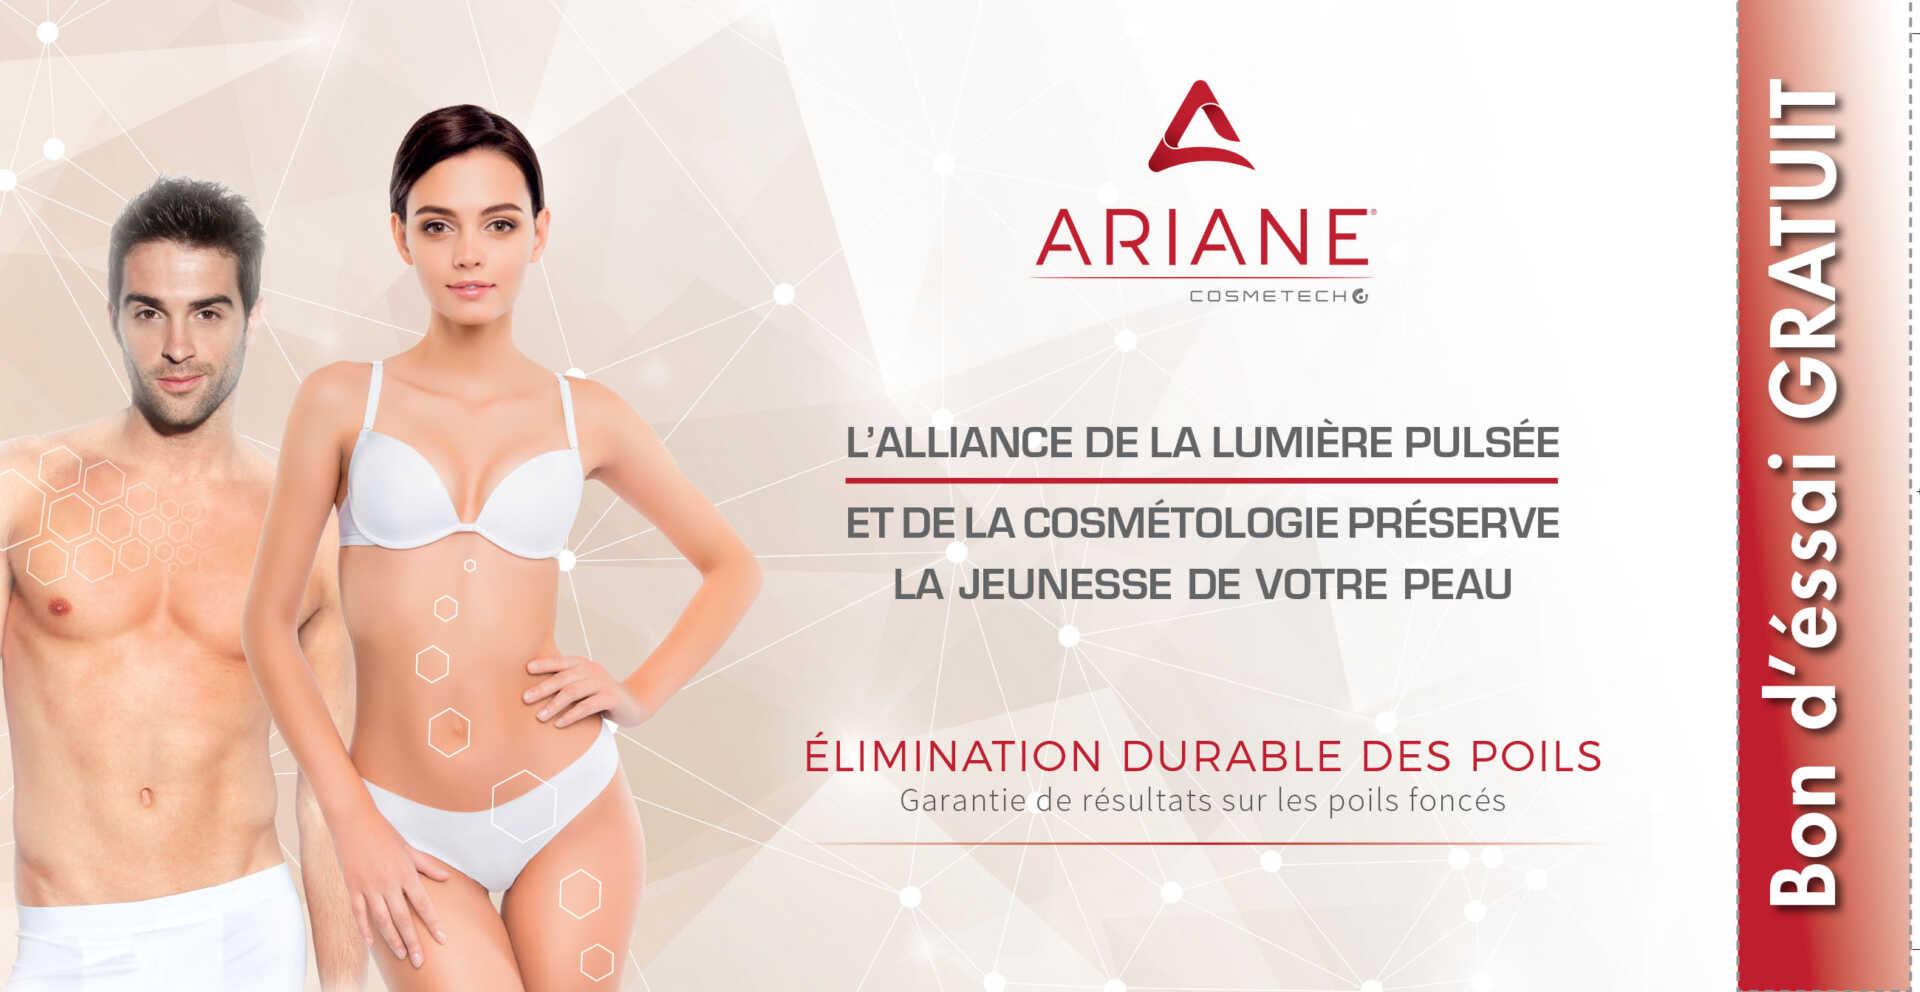 E9ARFIPP01-ARIANE-INVIT-PHOTOPIL-21x10_5-x500-BAT-1